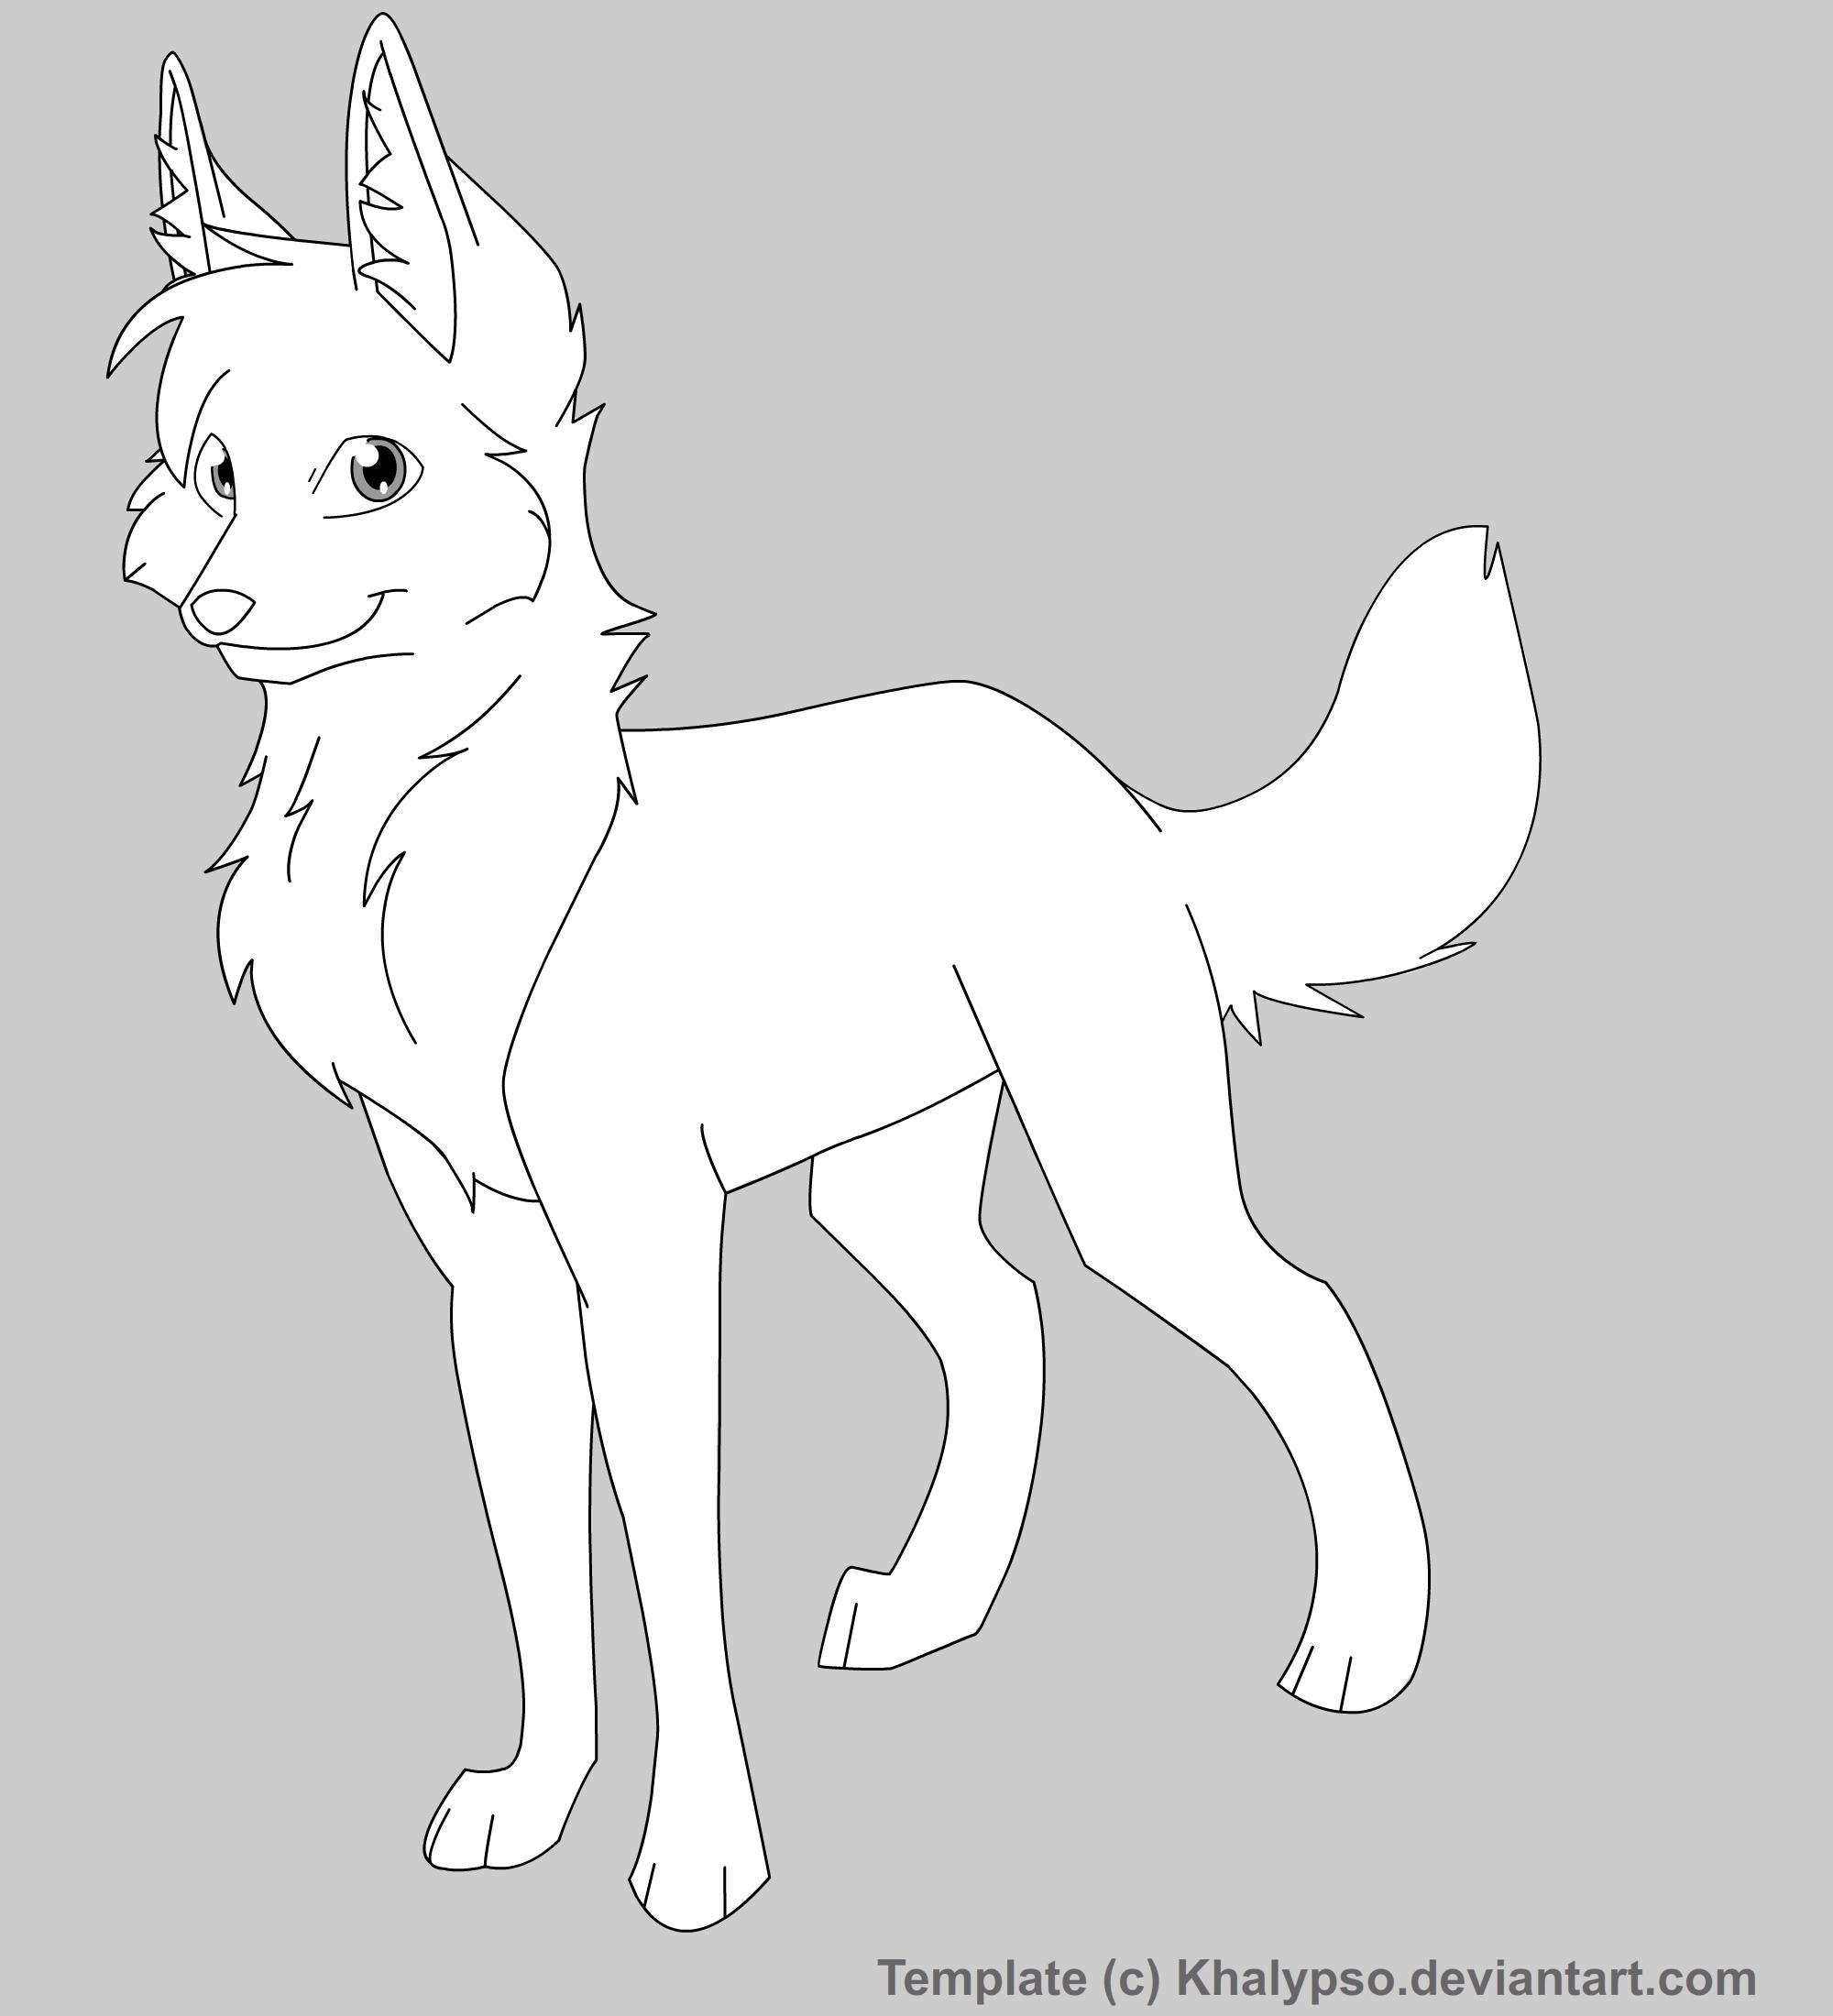 Wolf Template by Khalypso on DeviantArt